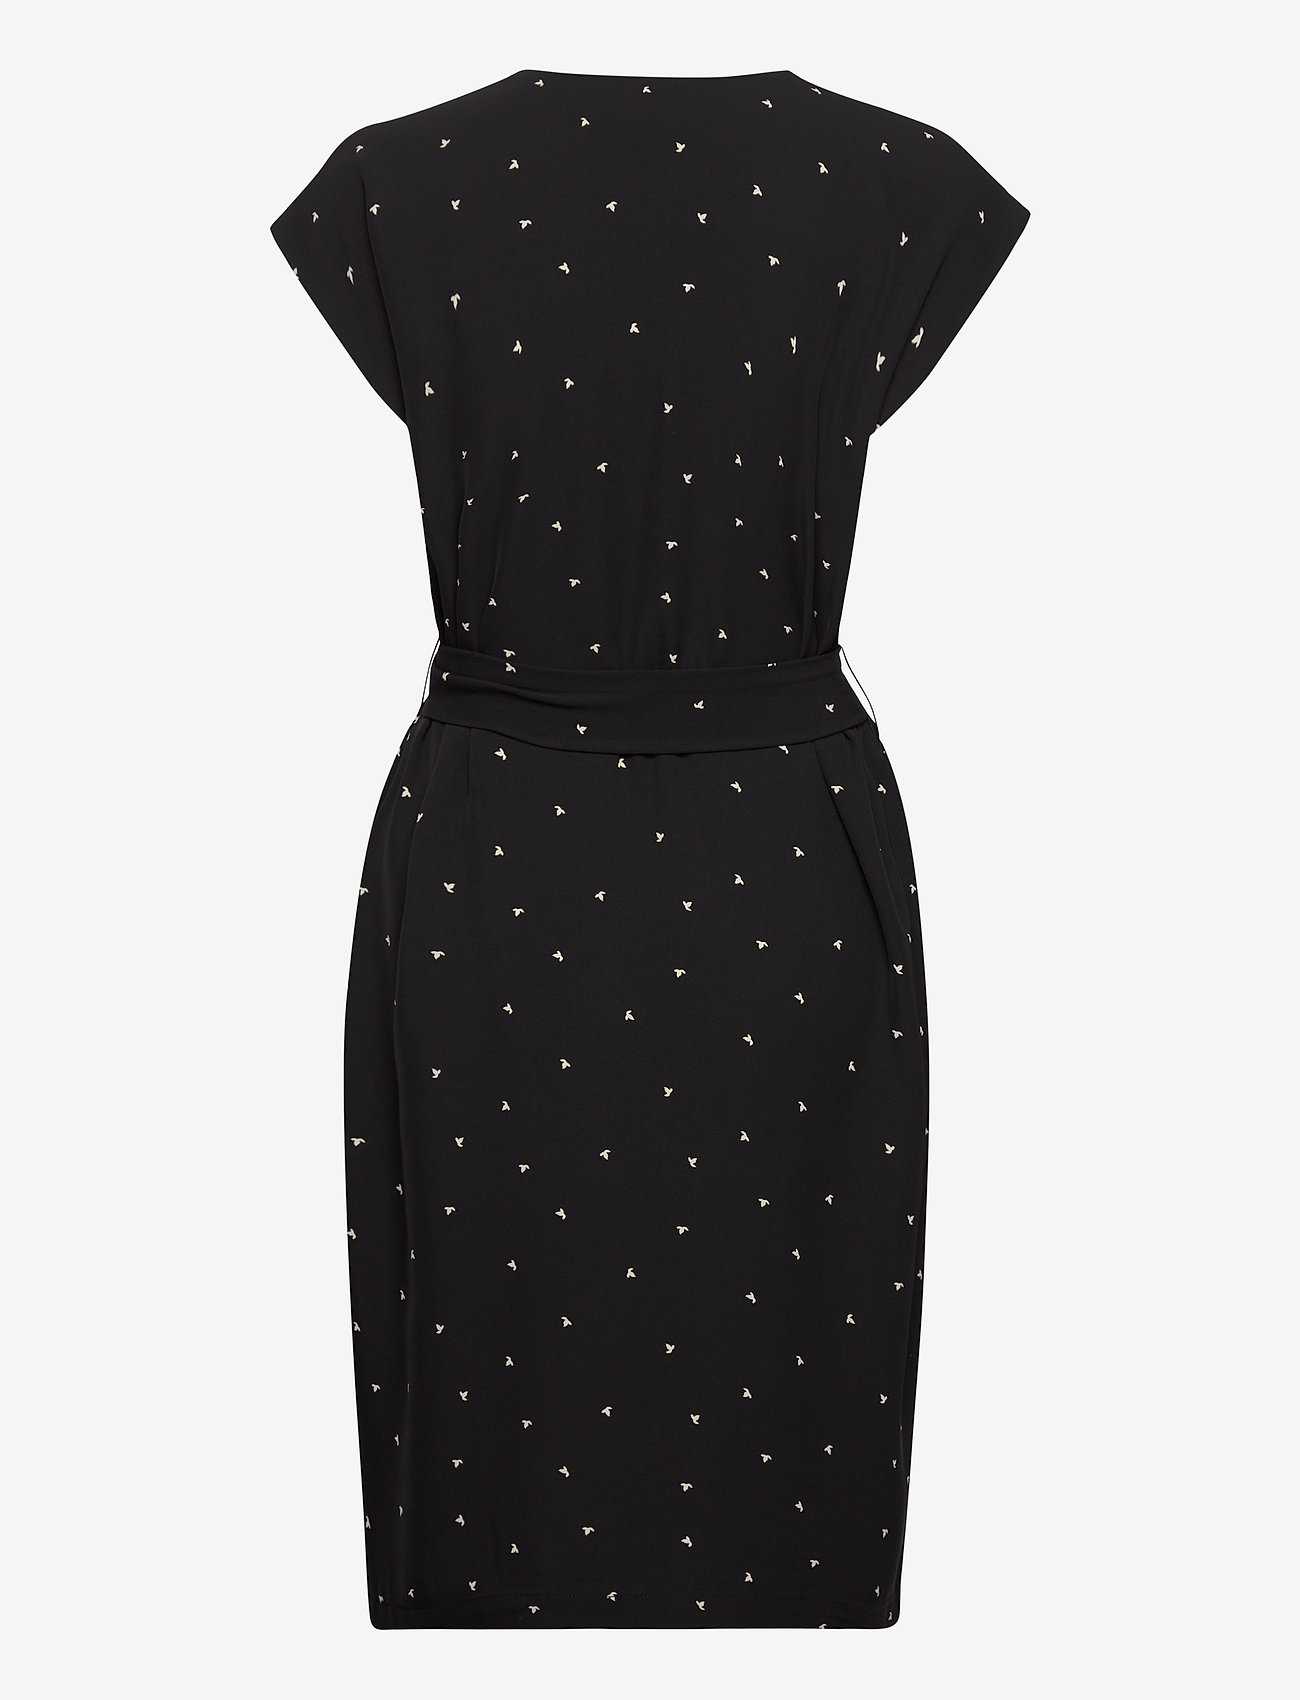 InWear ZanetaIW Dress - Kjoler BLACK SPACED DOTS - Dameklær Spesialtilbud